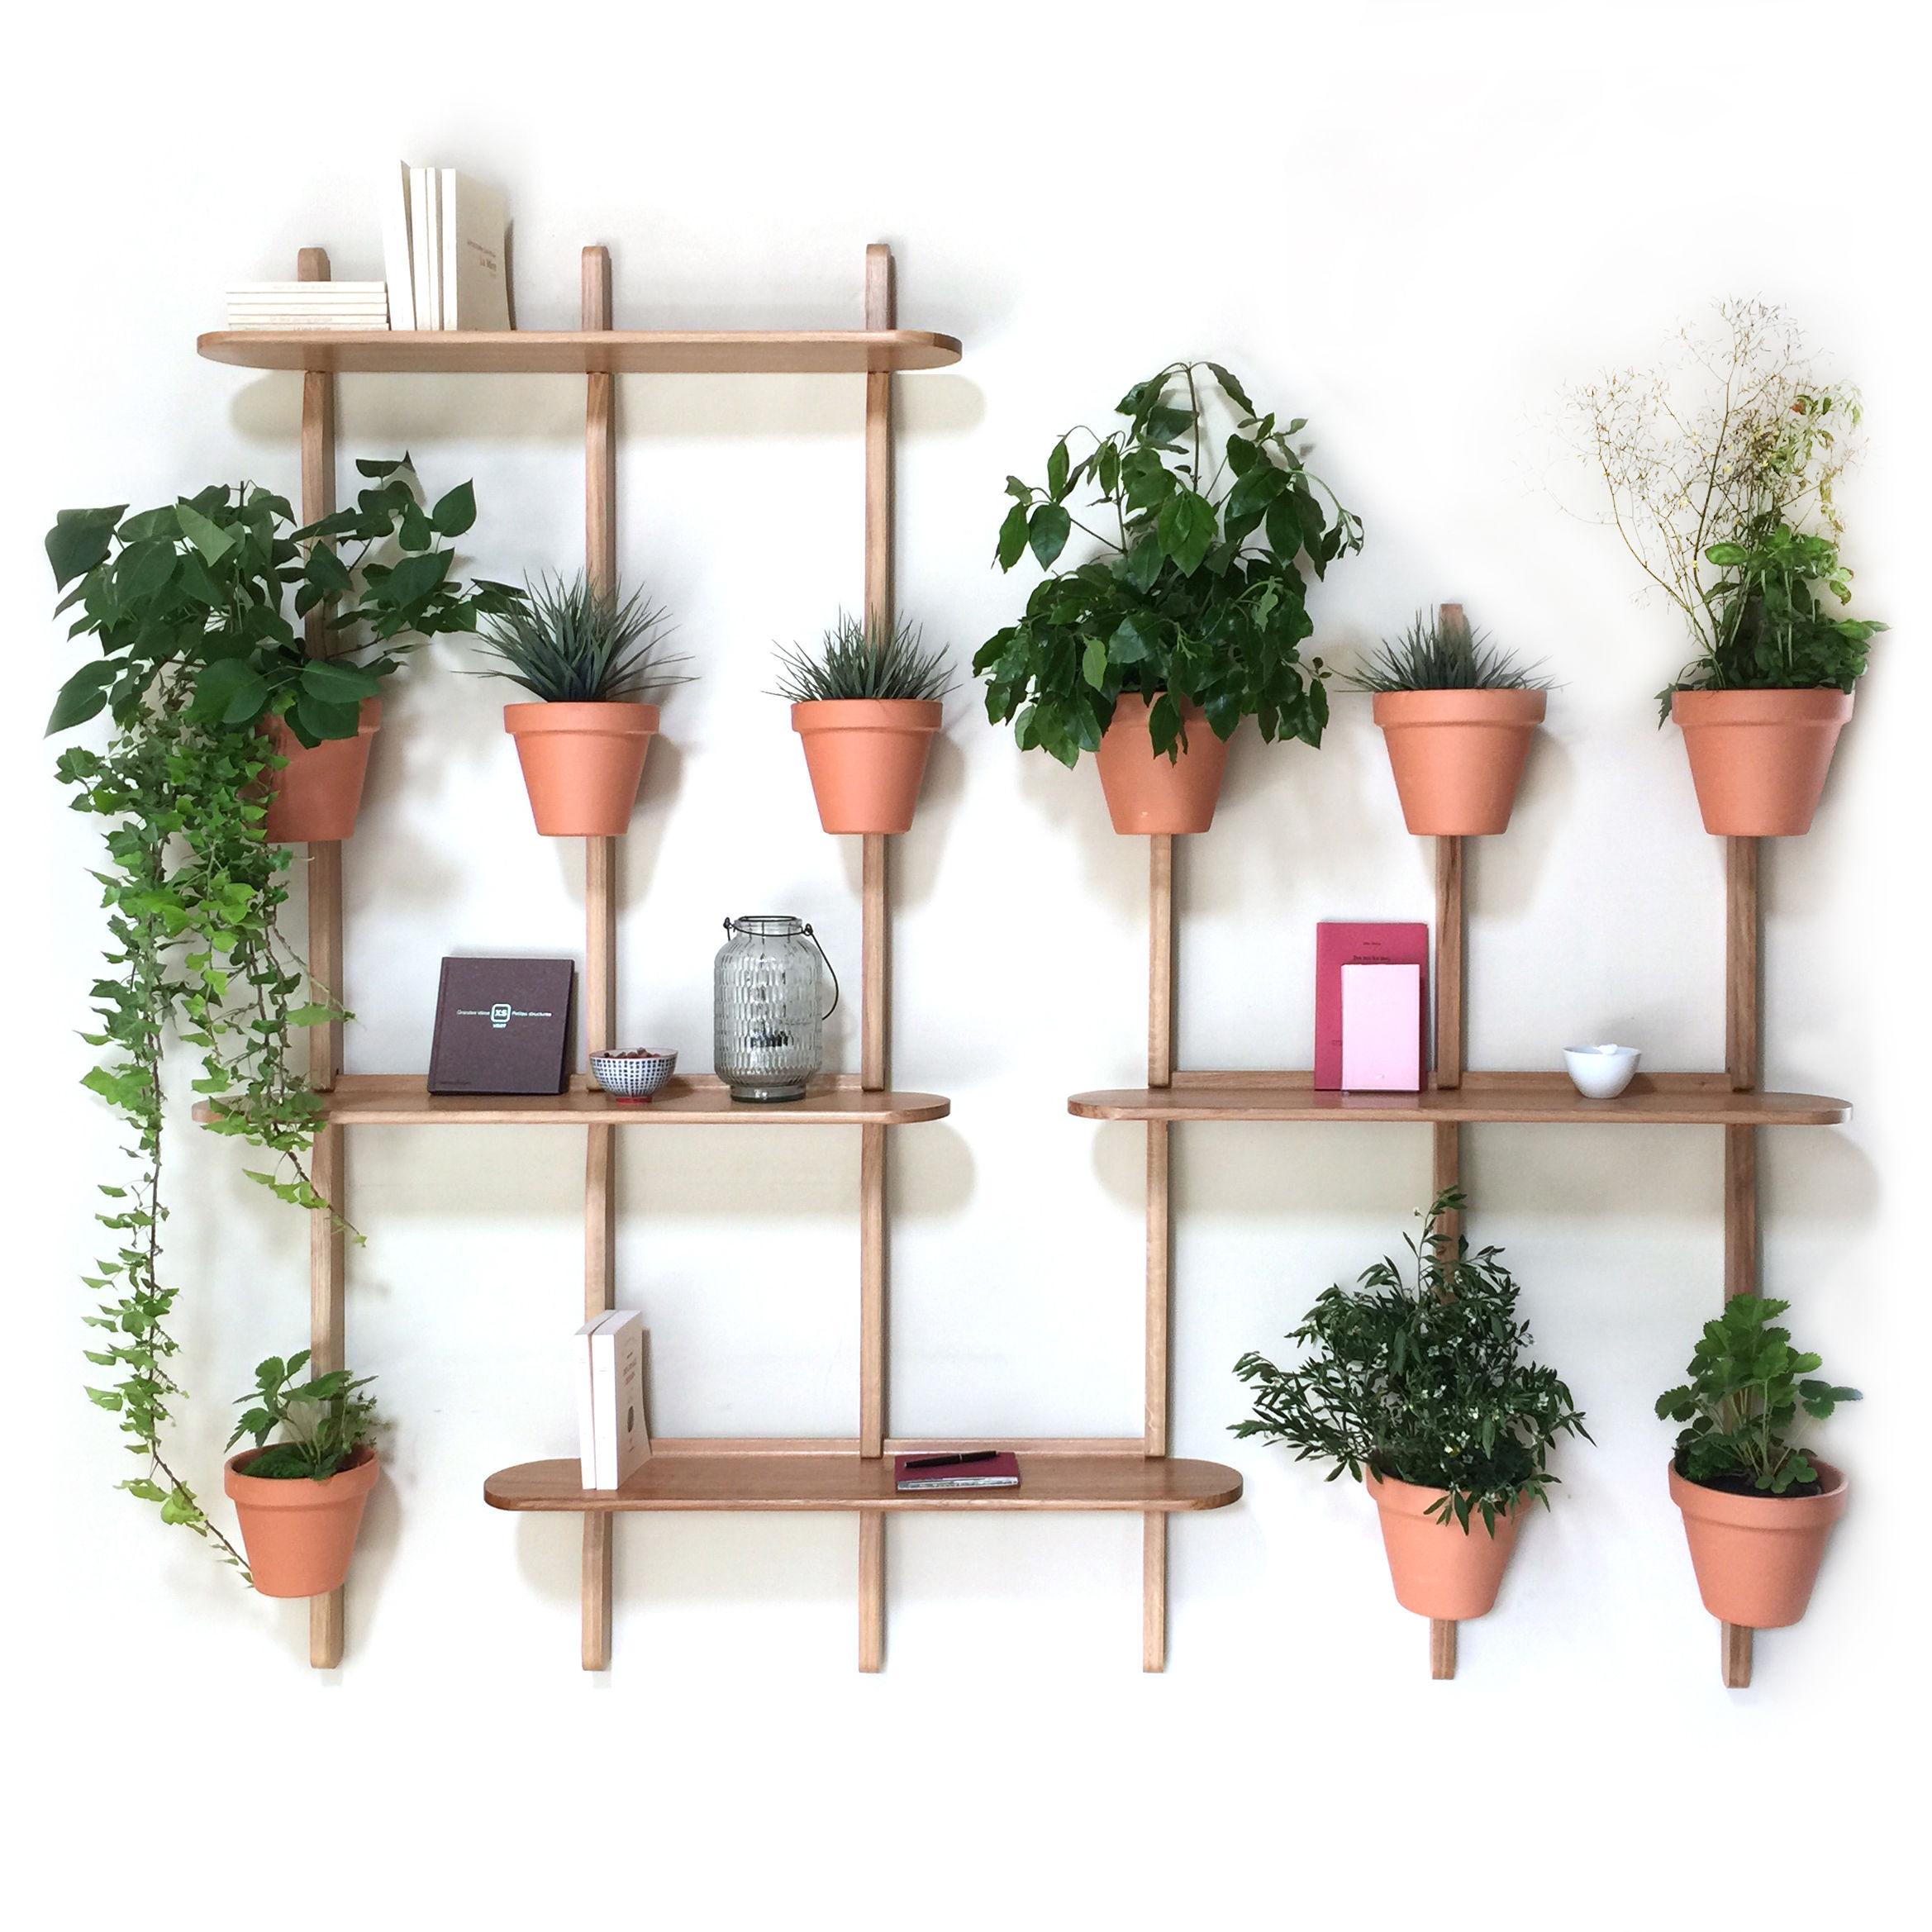 Furniture - Bookcases & Bookshelves - XPOT Shelf - / 4 round shelves L 100 cm + 3 supports H 200 cm + 3 supports H 150 cm by Compagnie - Round shelf / Oak - Varnished solid oak